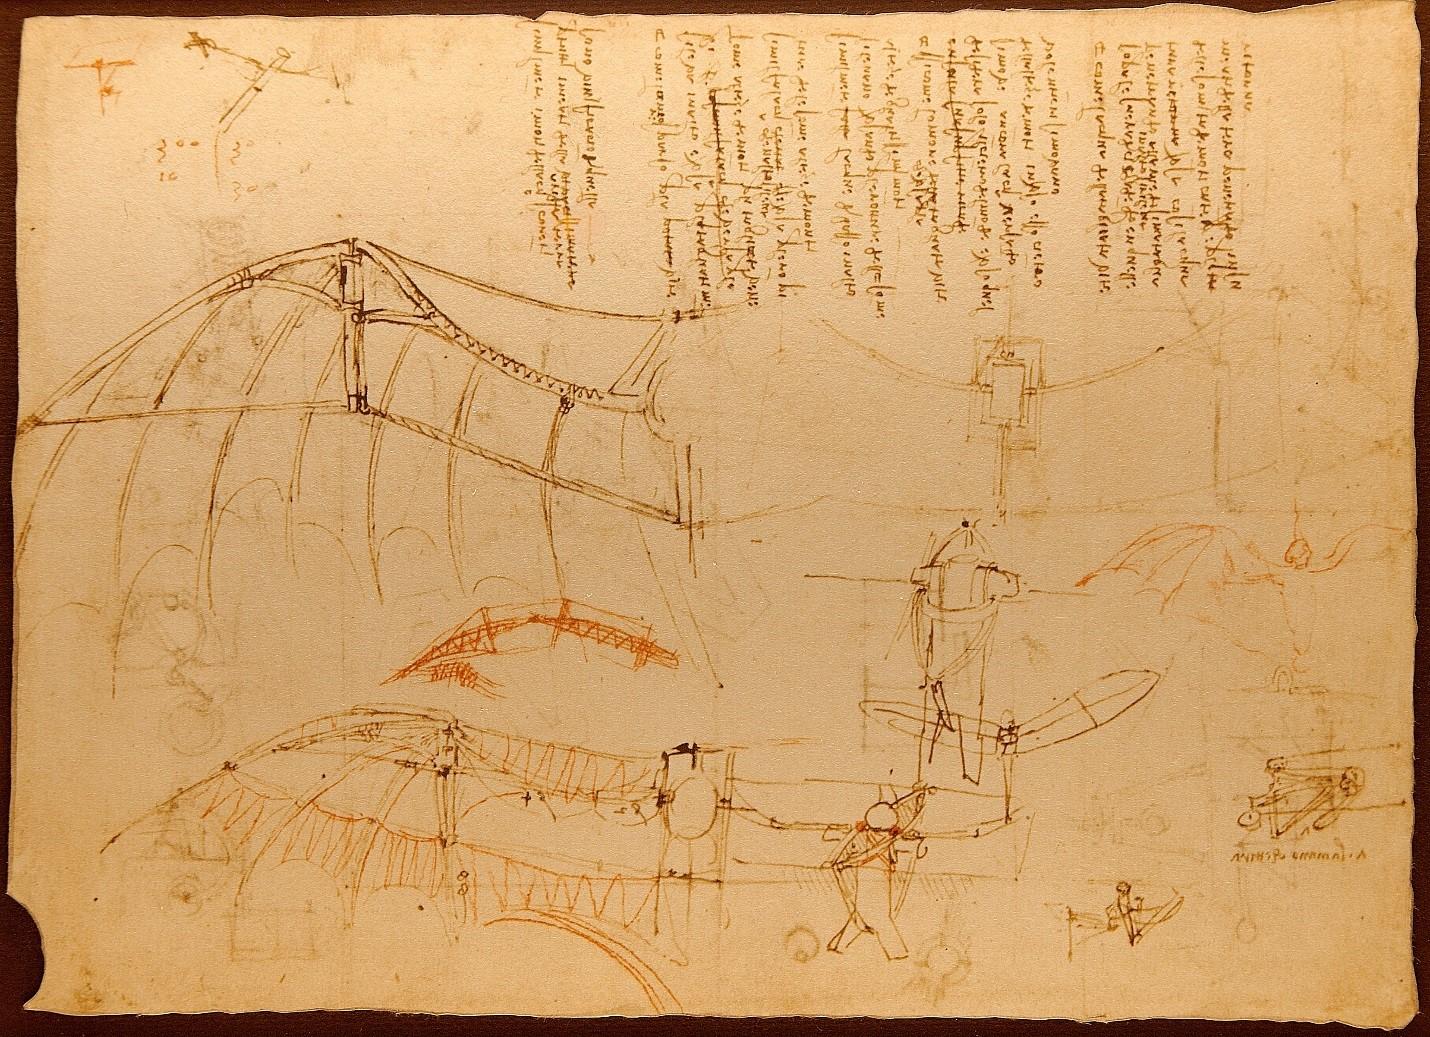 Leonardo da vinci essay helicopter